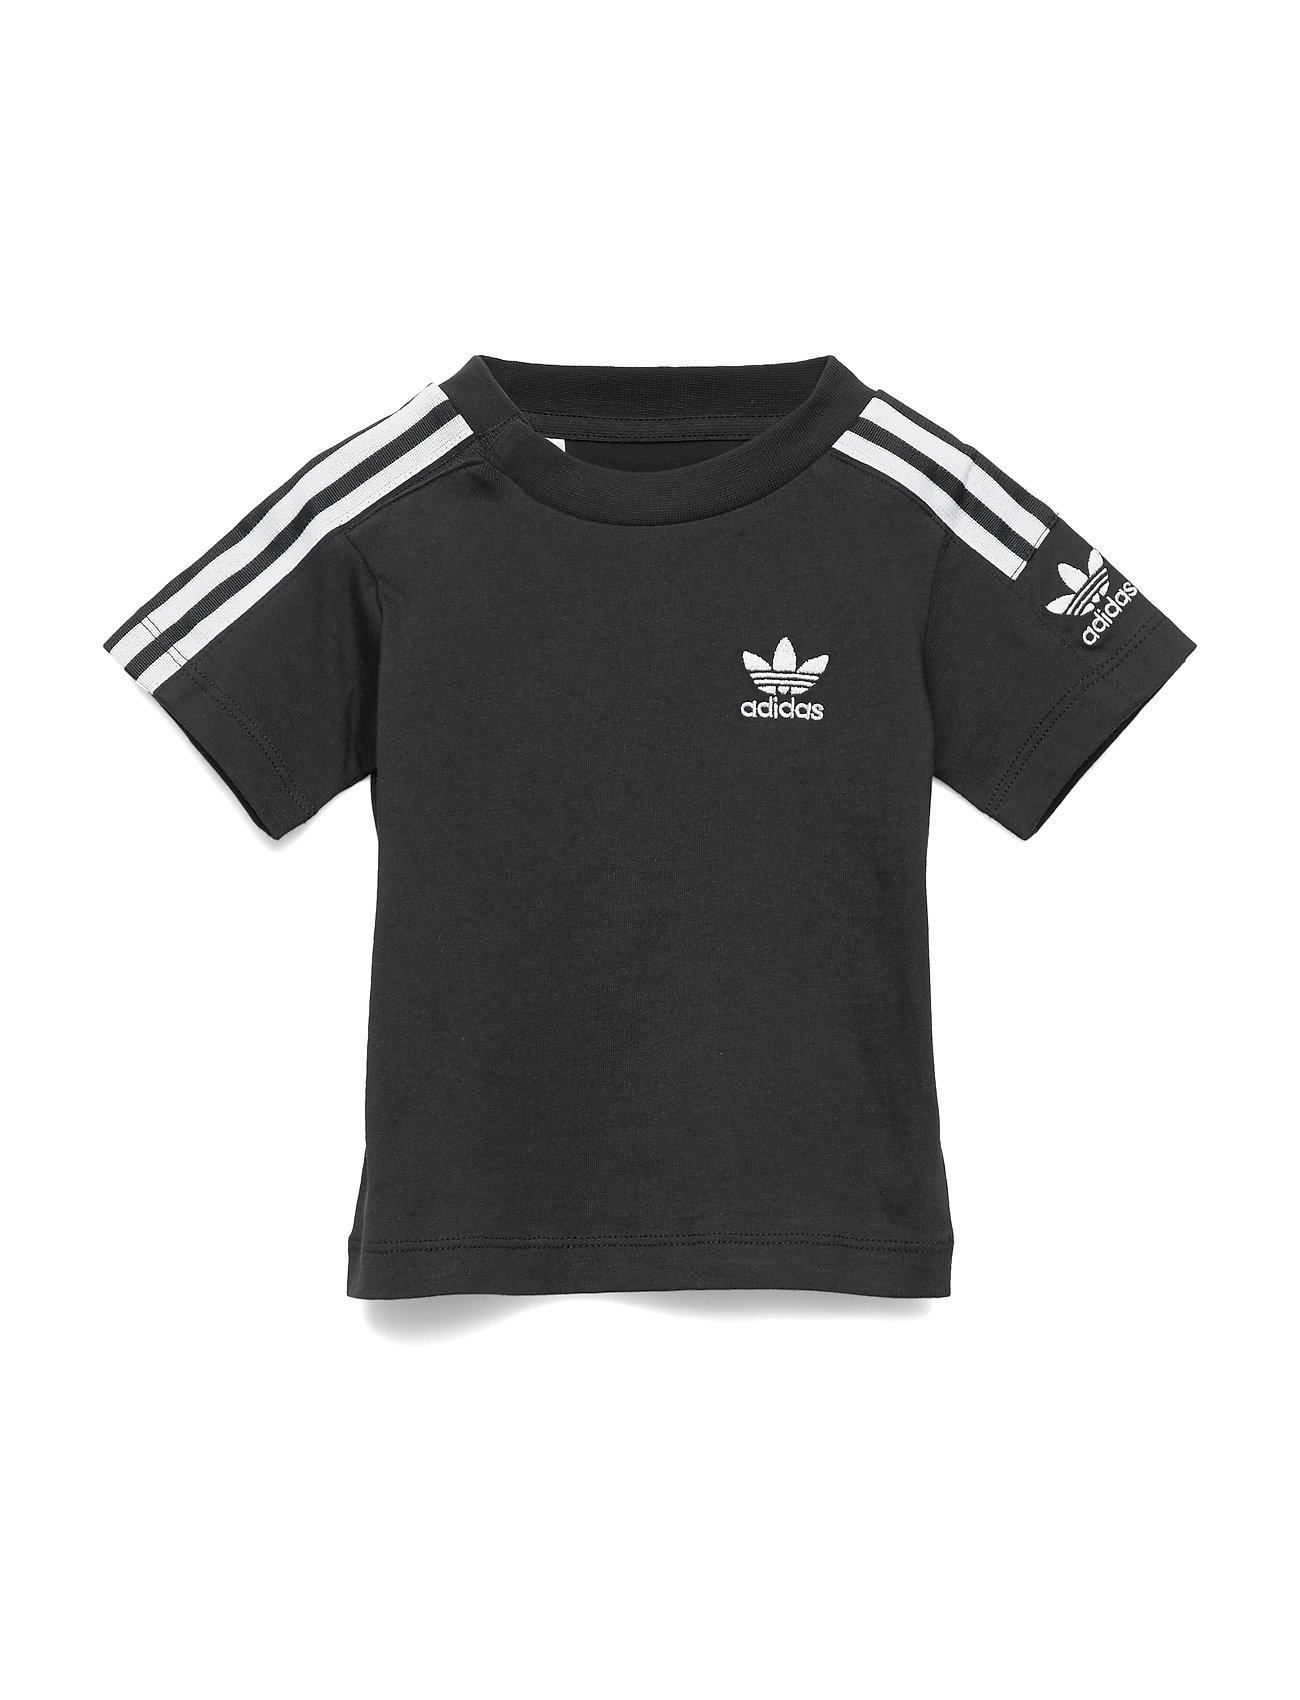 adidas Originals NEW ICON TEE - BLACK/WHITE